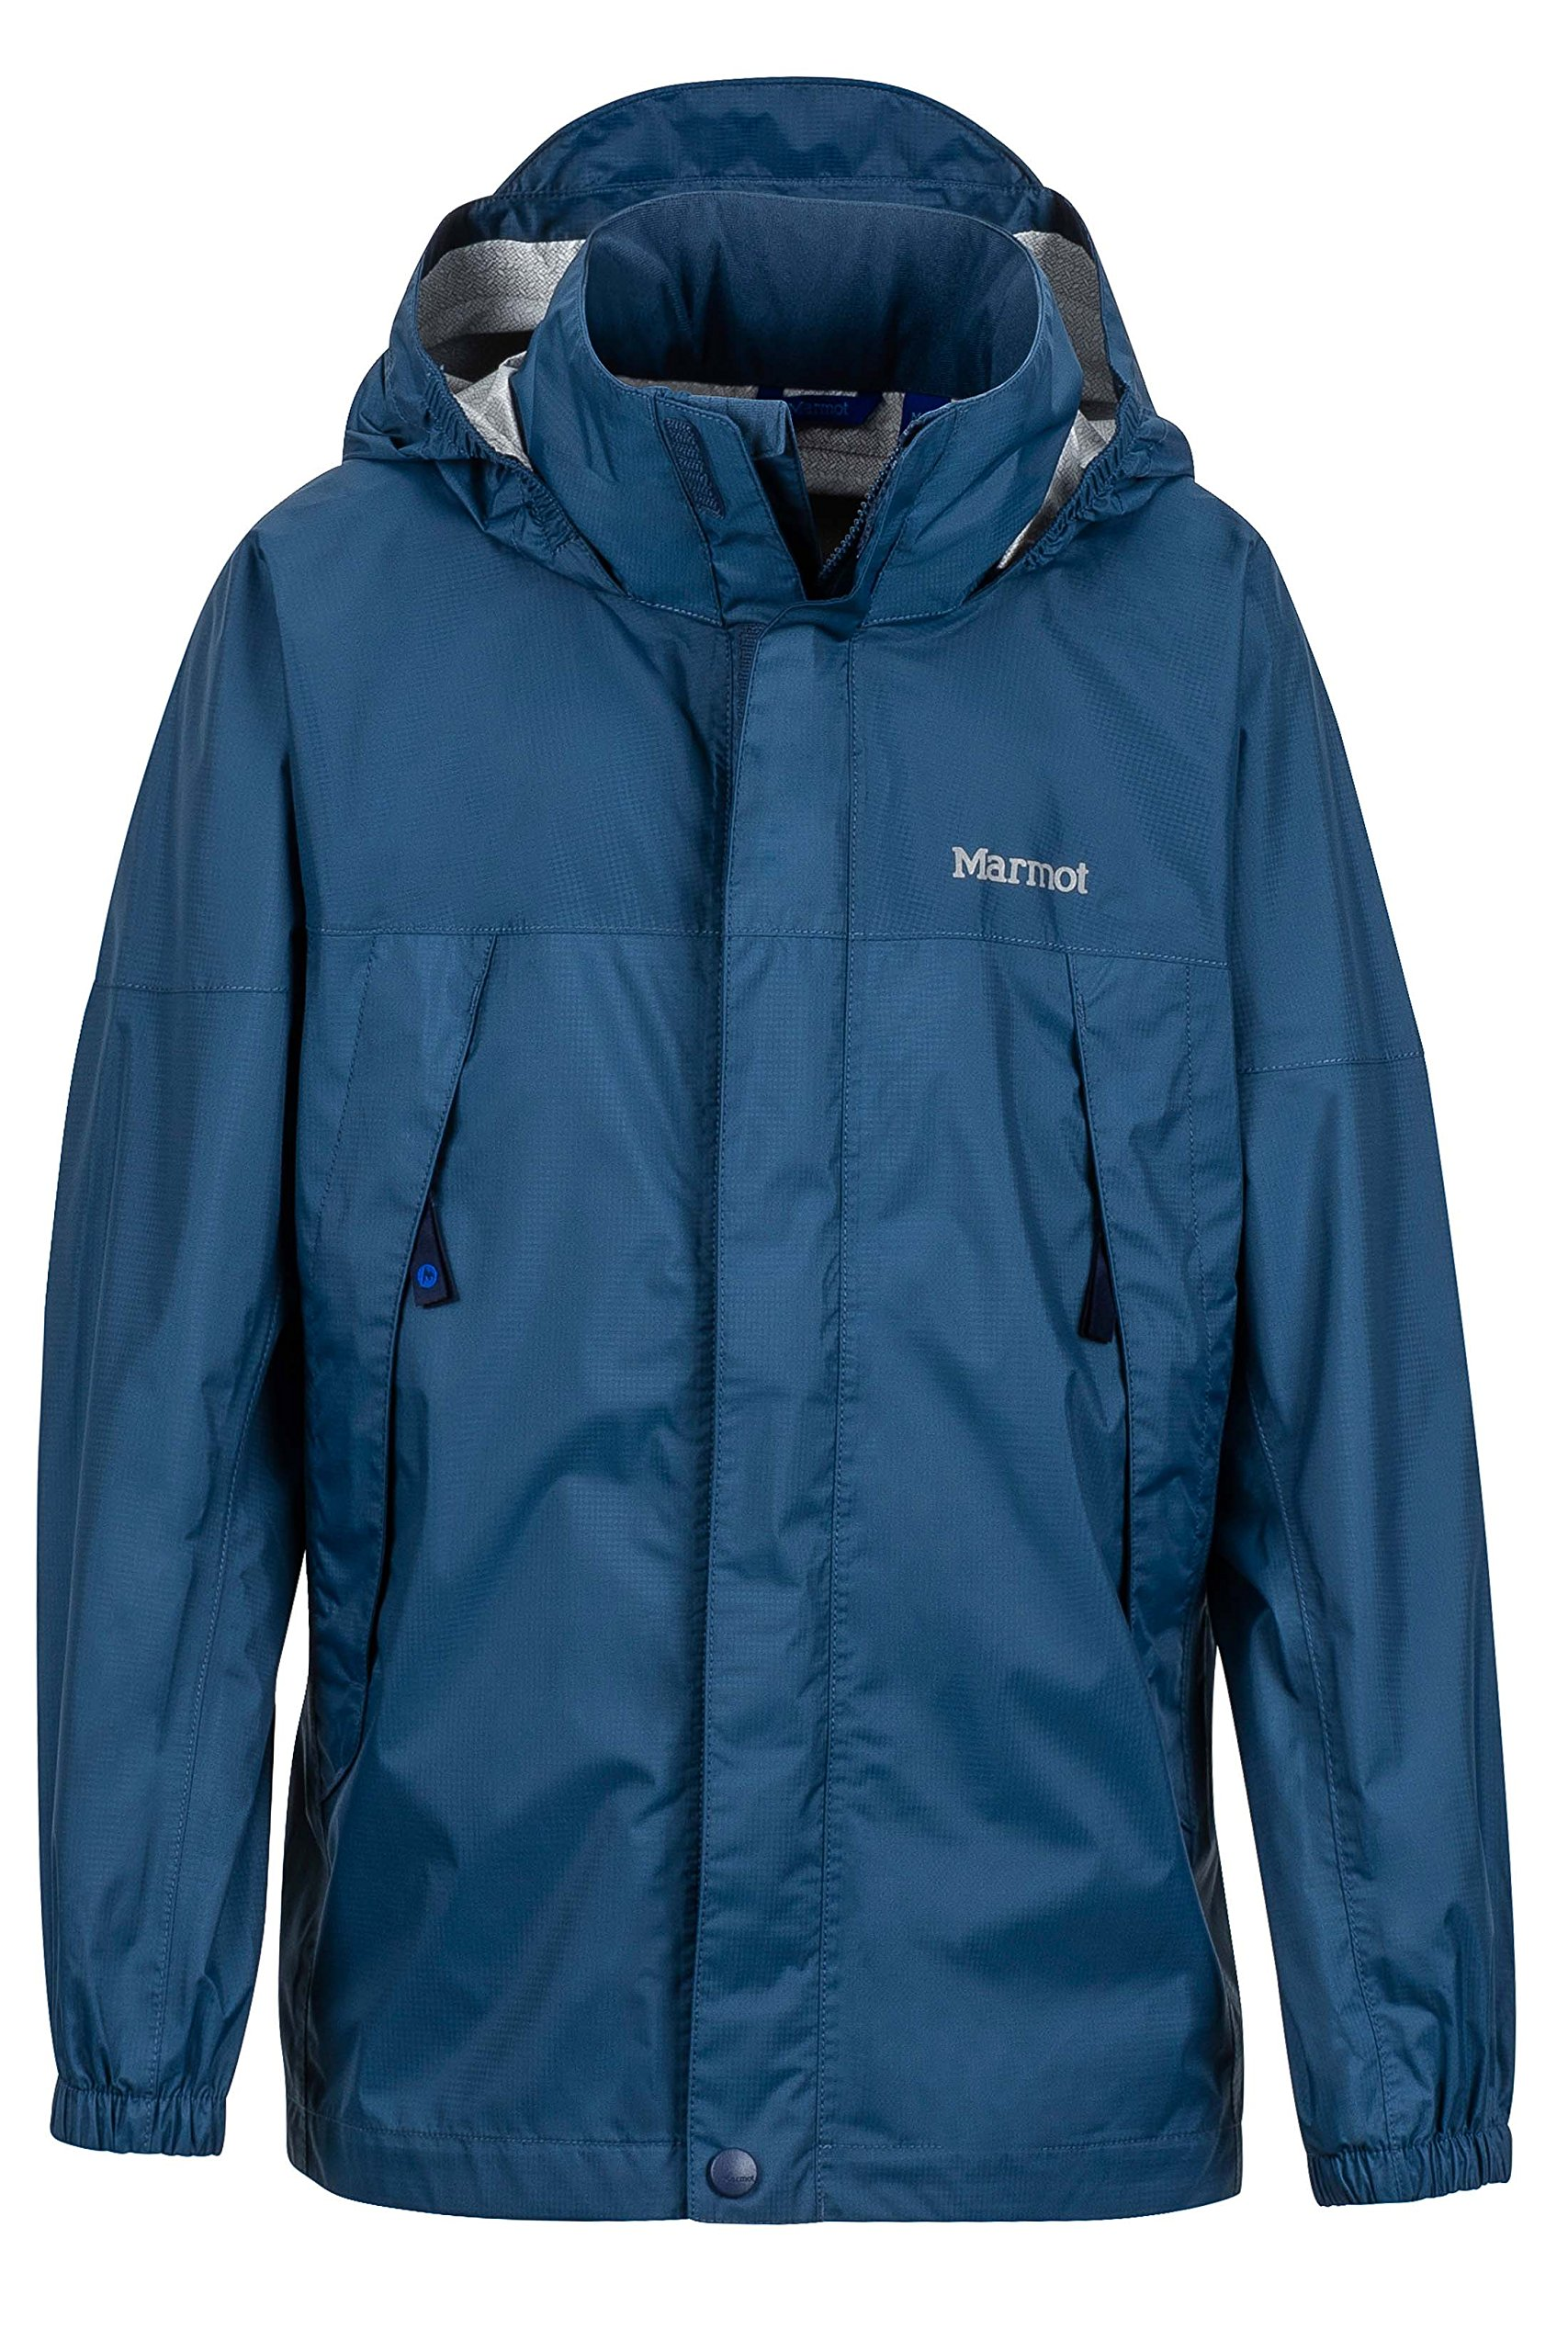 Marmot PreCip Boys' Lightweight Waterproof Rain Jacket, Vintage Navy, Small